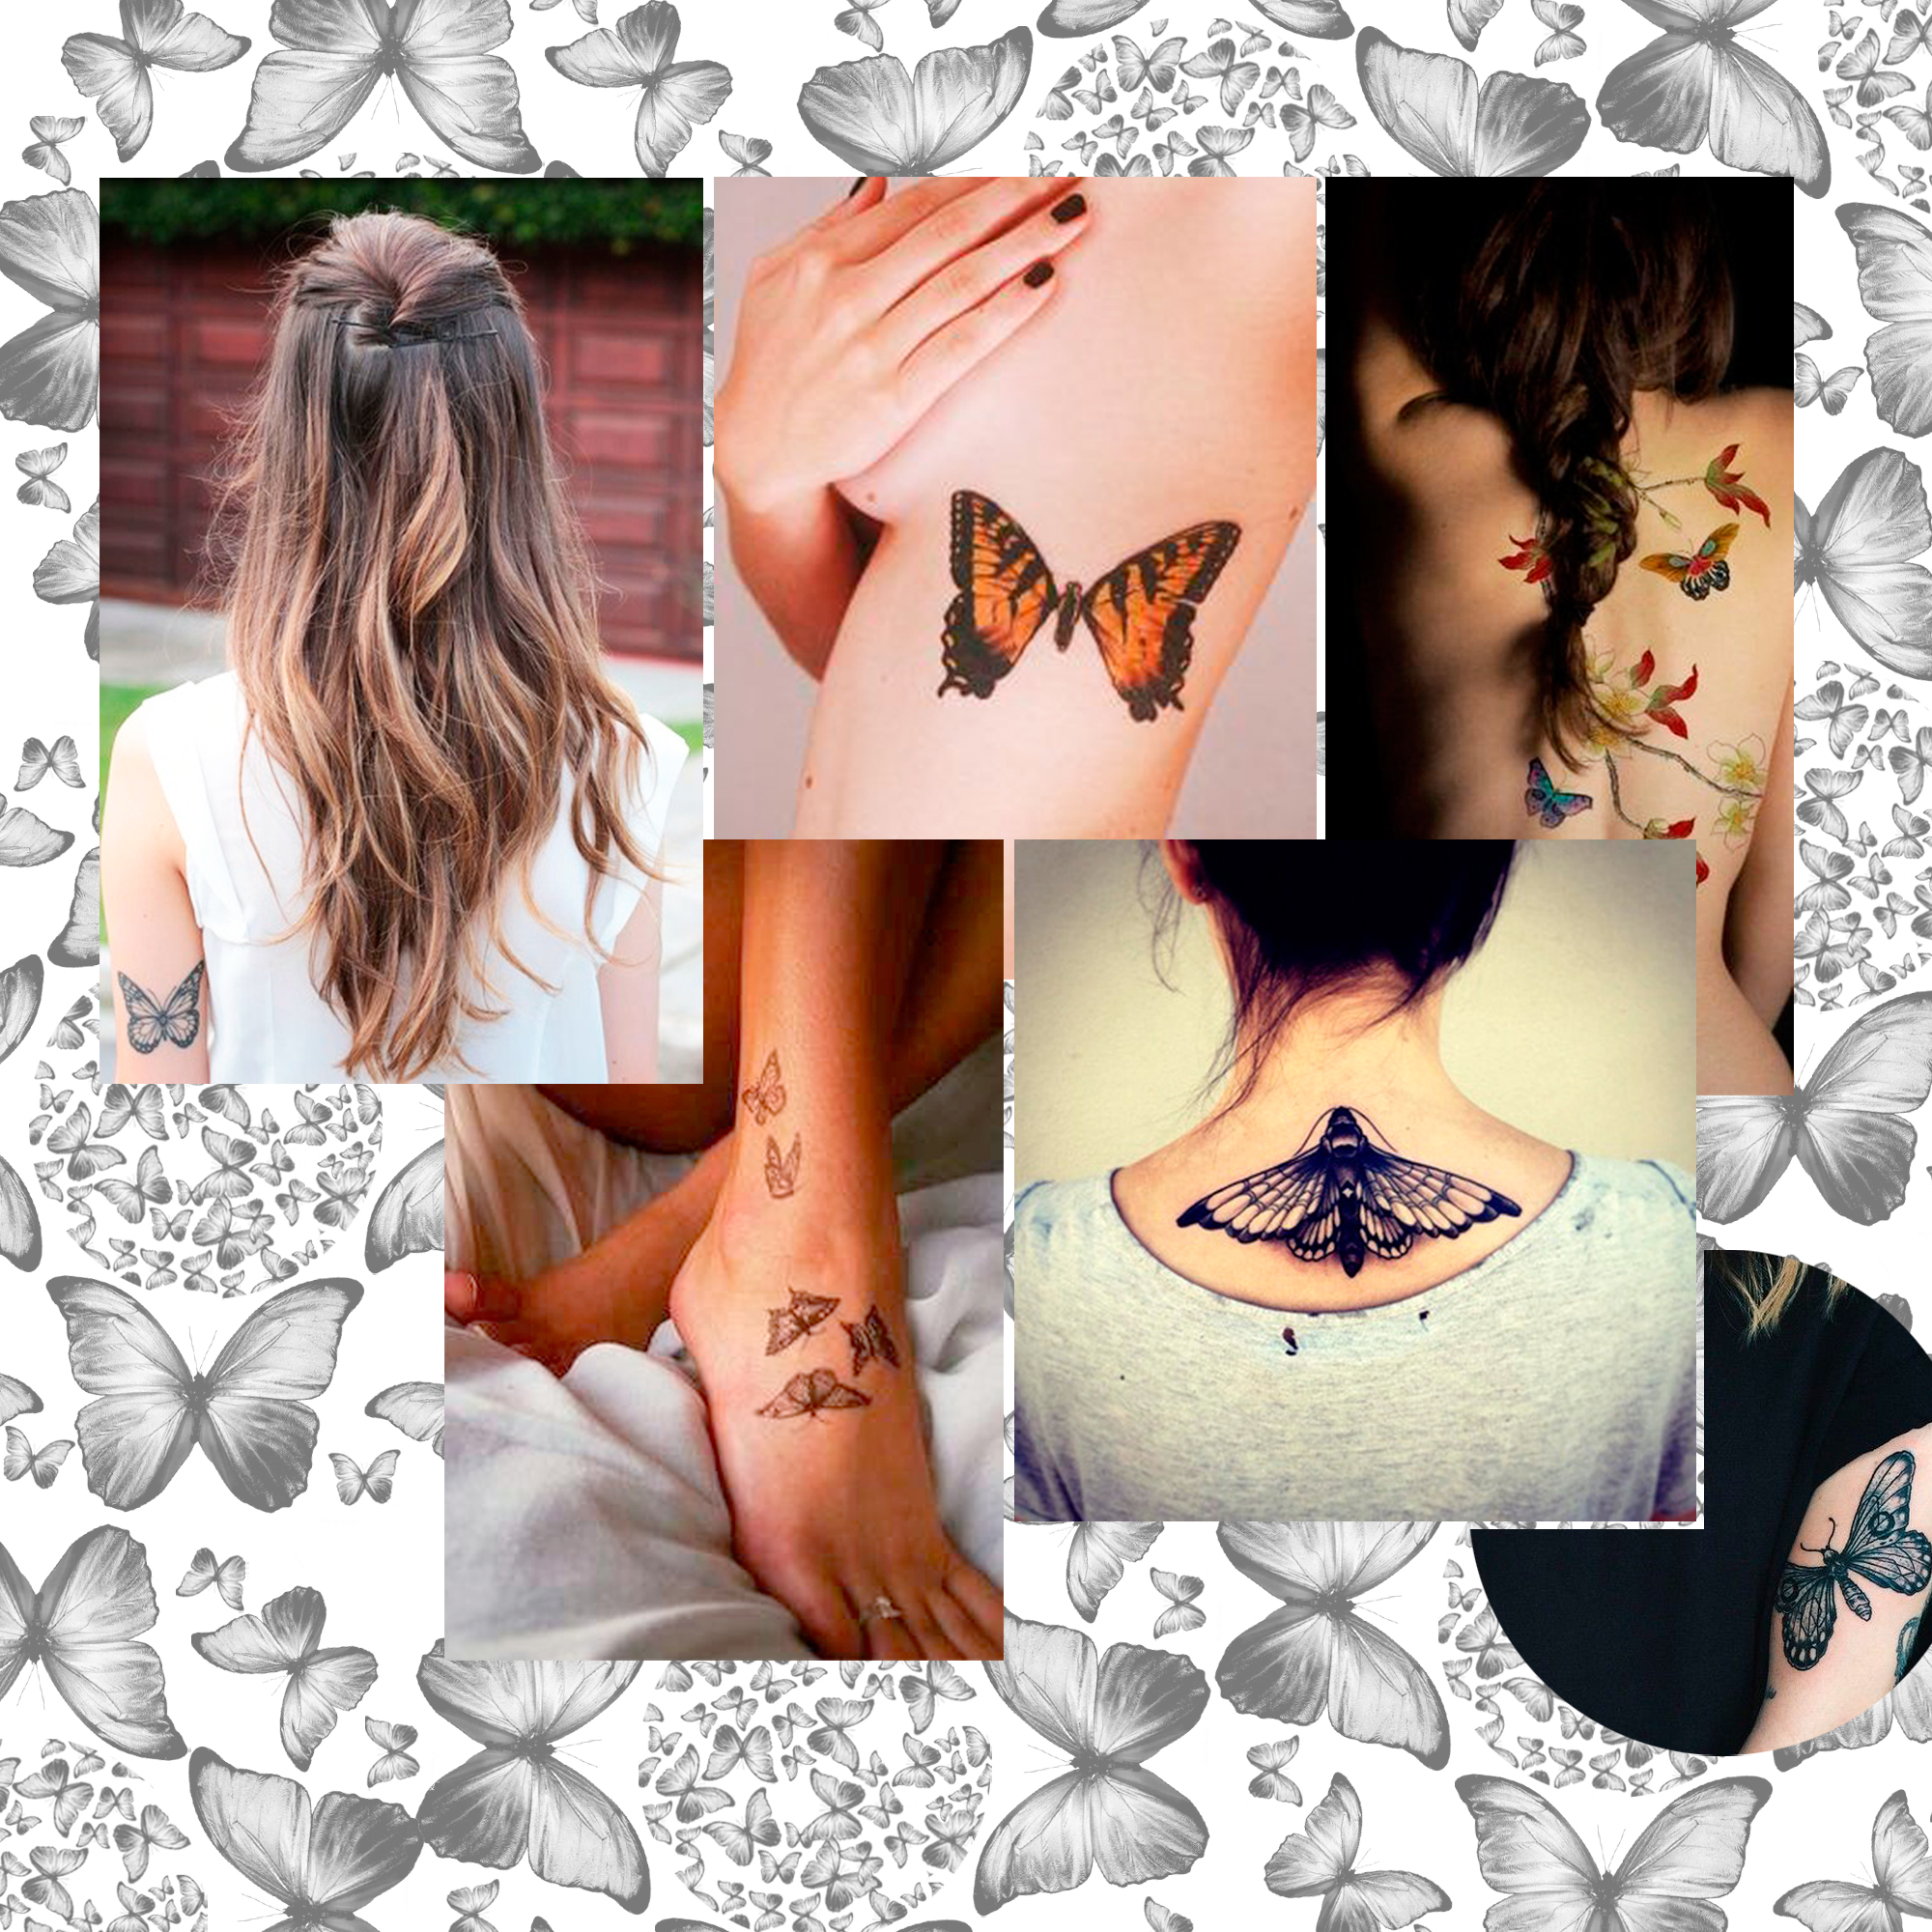 tatouage papillon les plus jolis mod les de tatouages. Black Bedroom Furniture Sets. Home Design Ideas